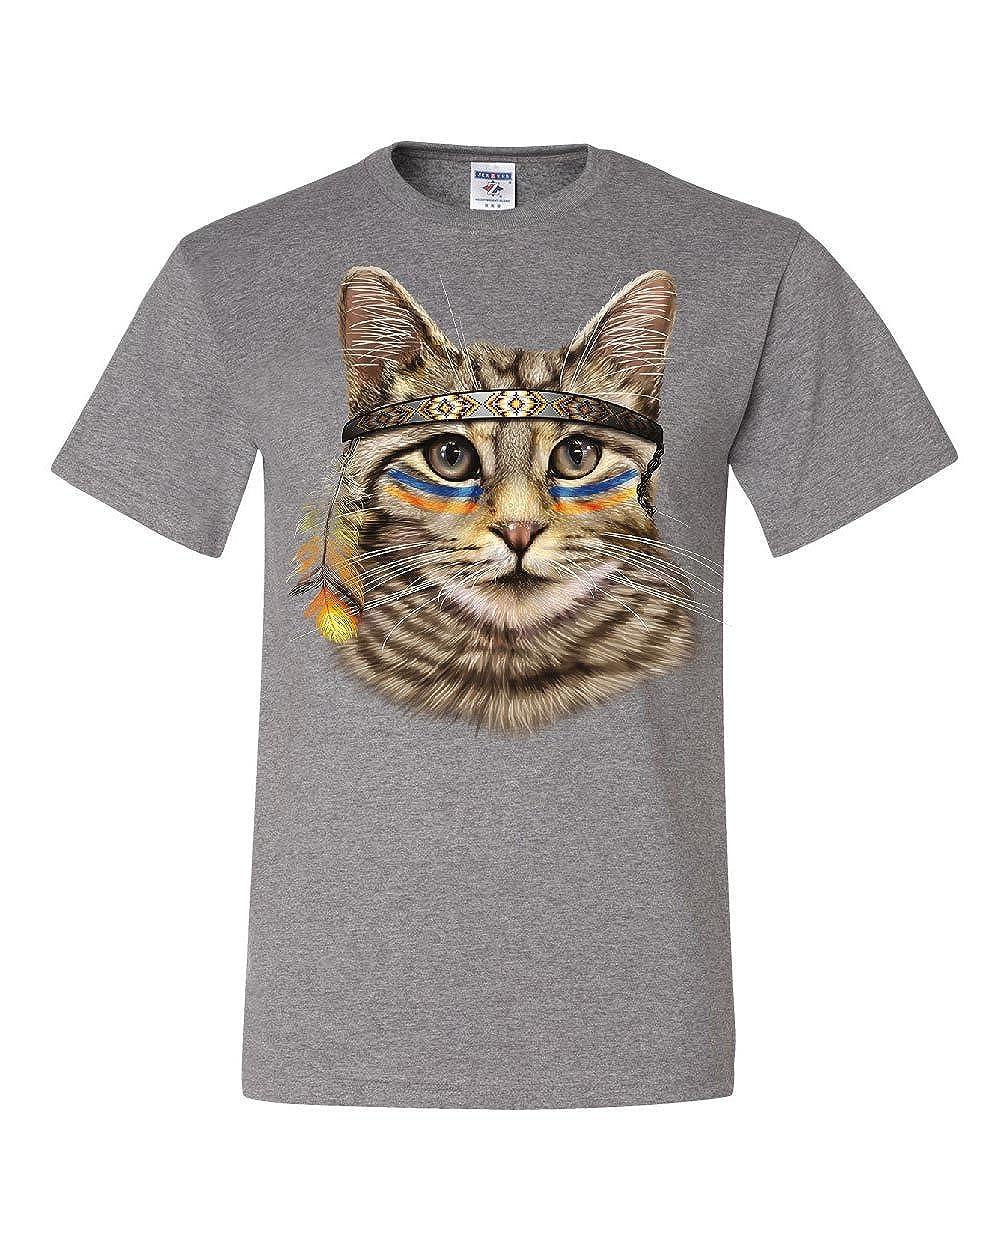 Native American Chief Cat Long Sleeve T-Shirt Cat Lovers Kitten Headdress Tee